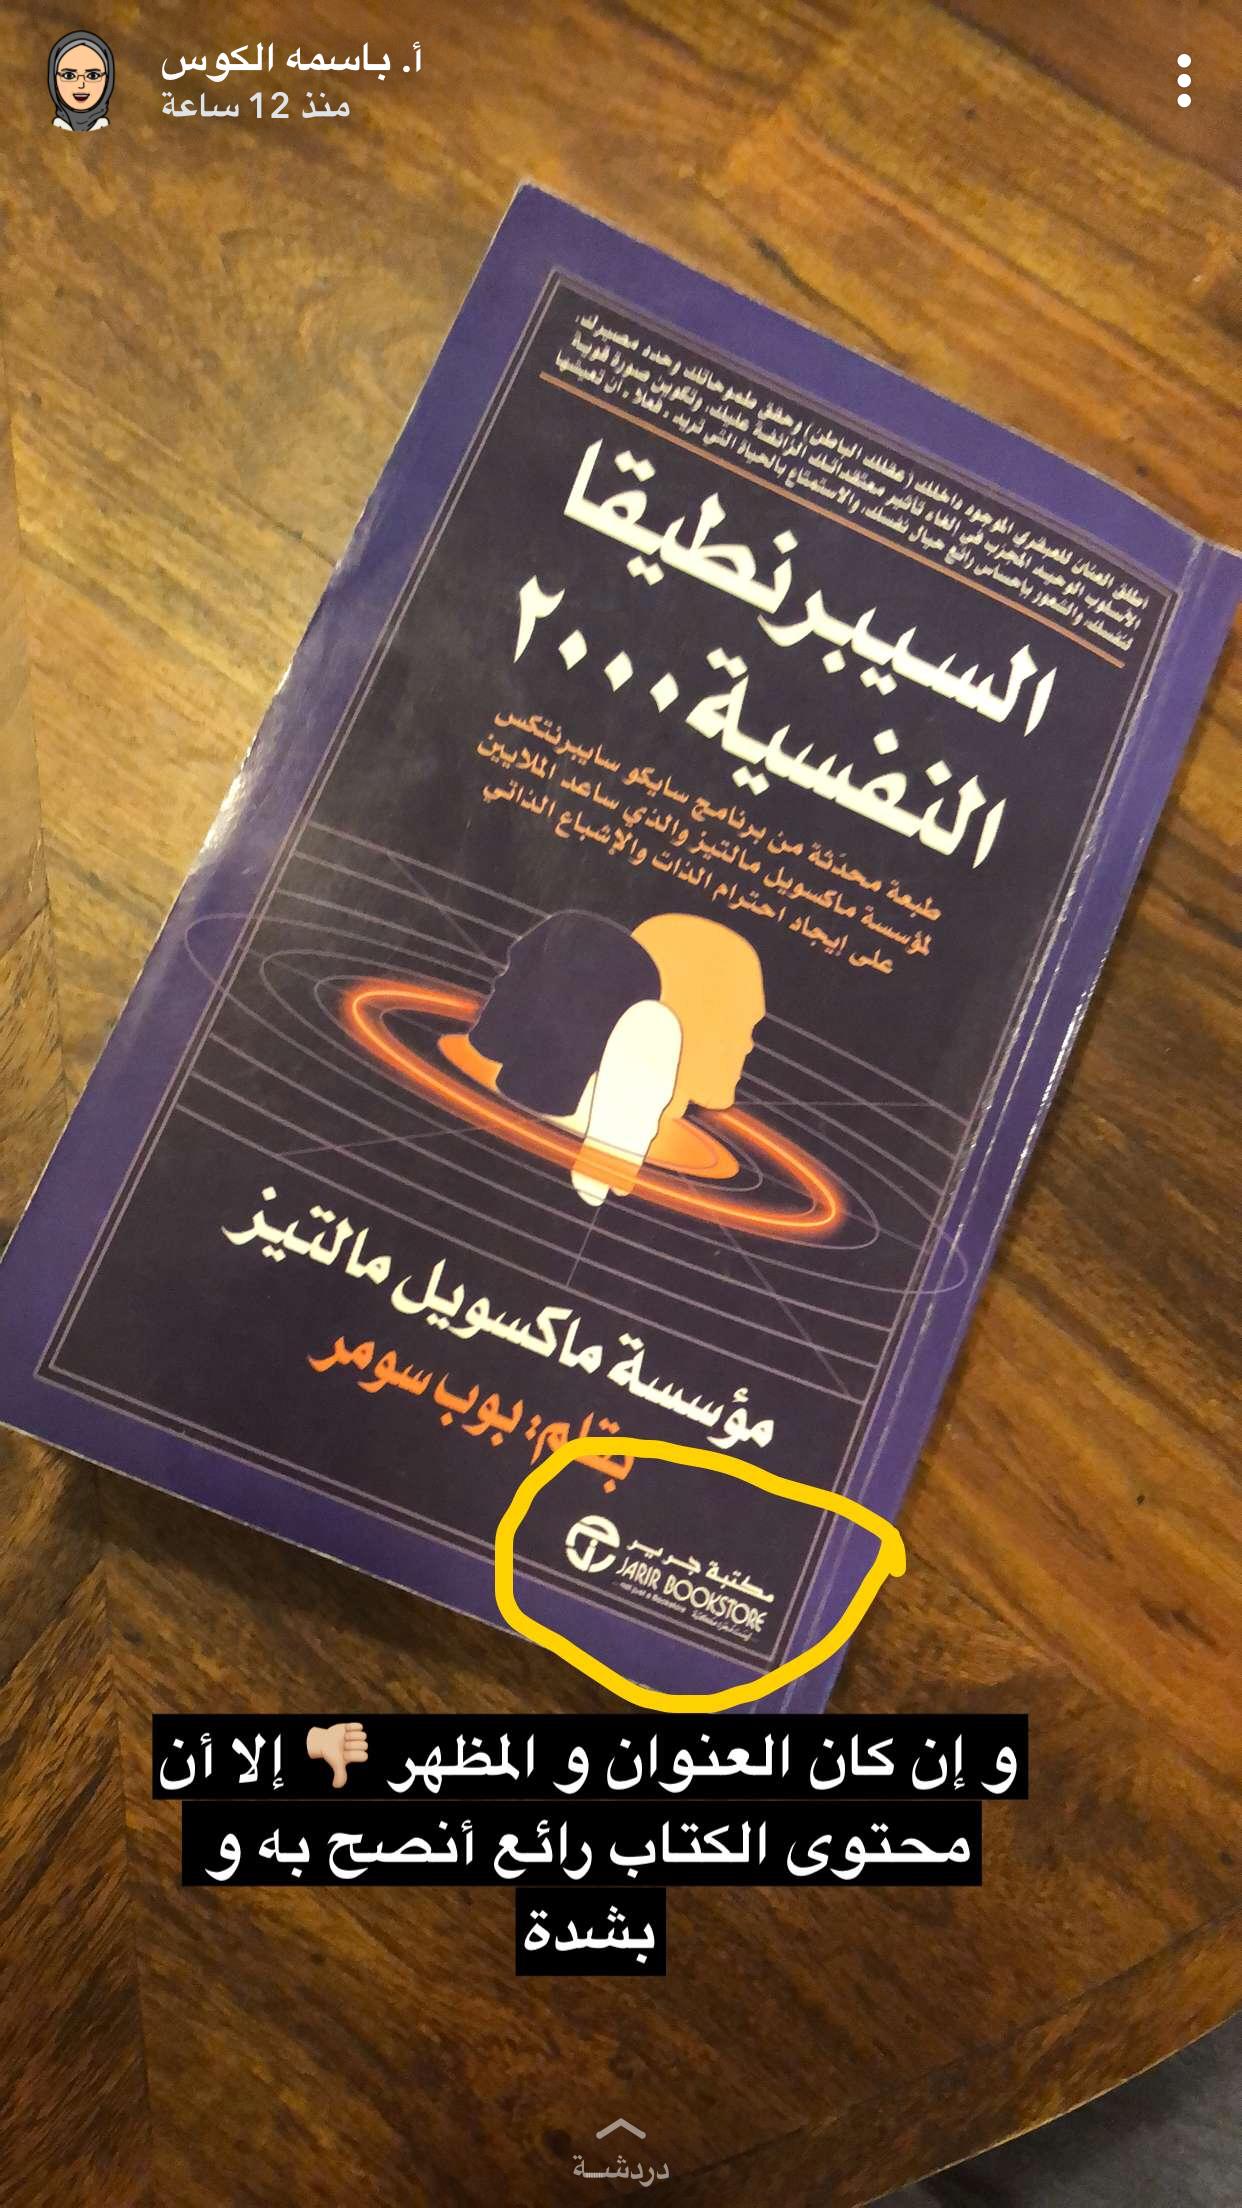 Pin By Yara Alomri On كتب Books Book Club Books Inspirational Books